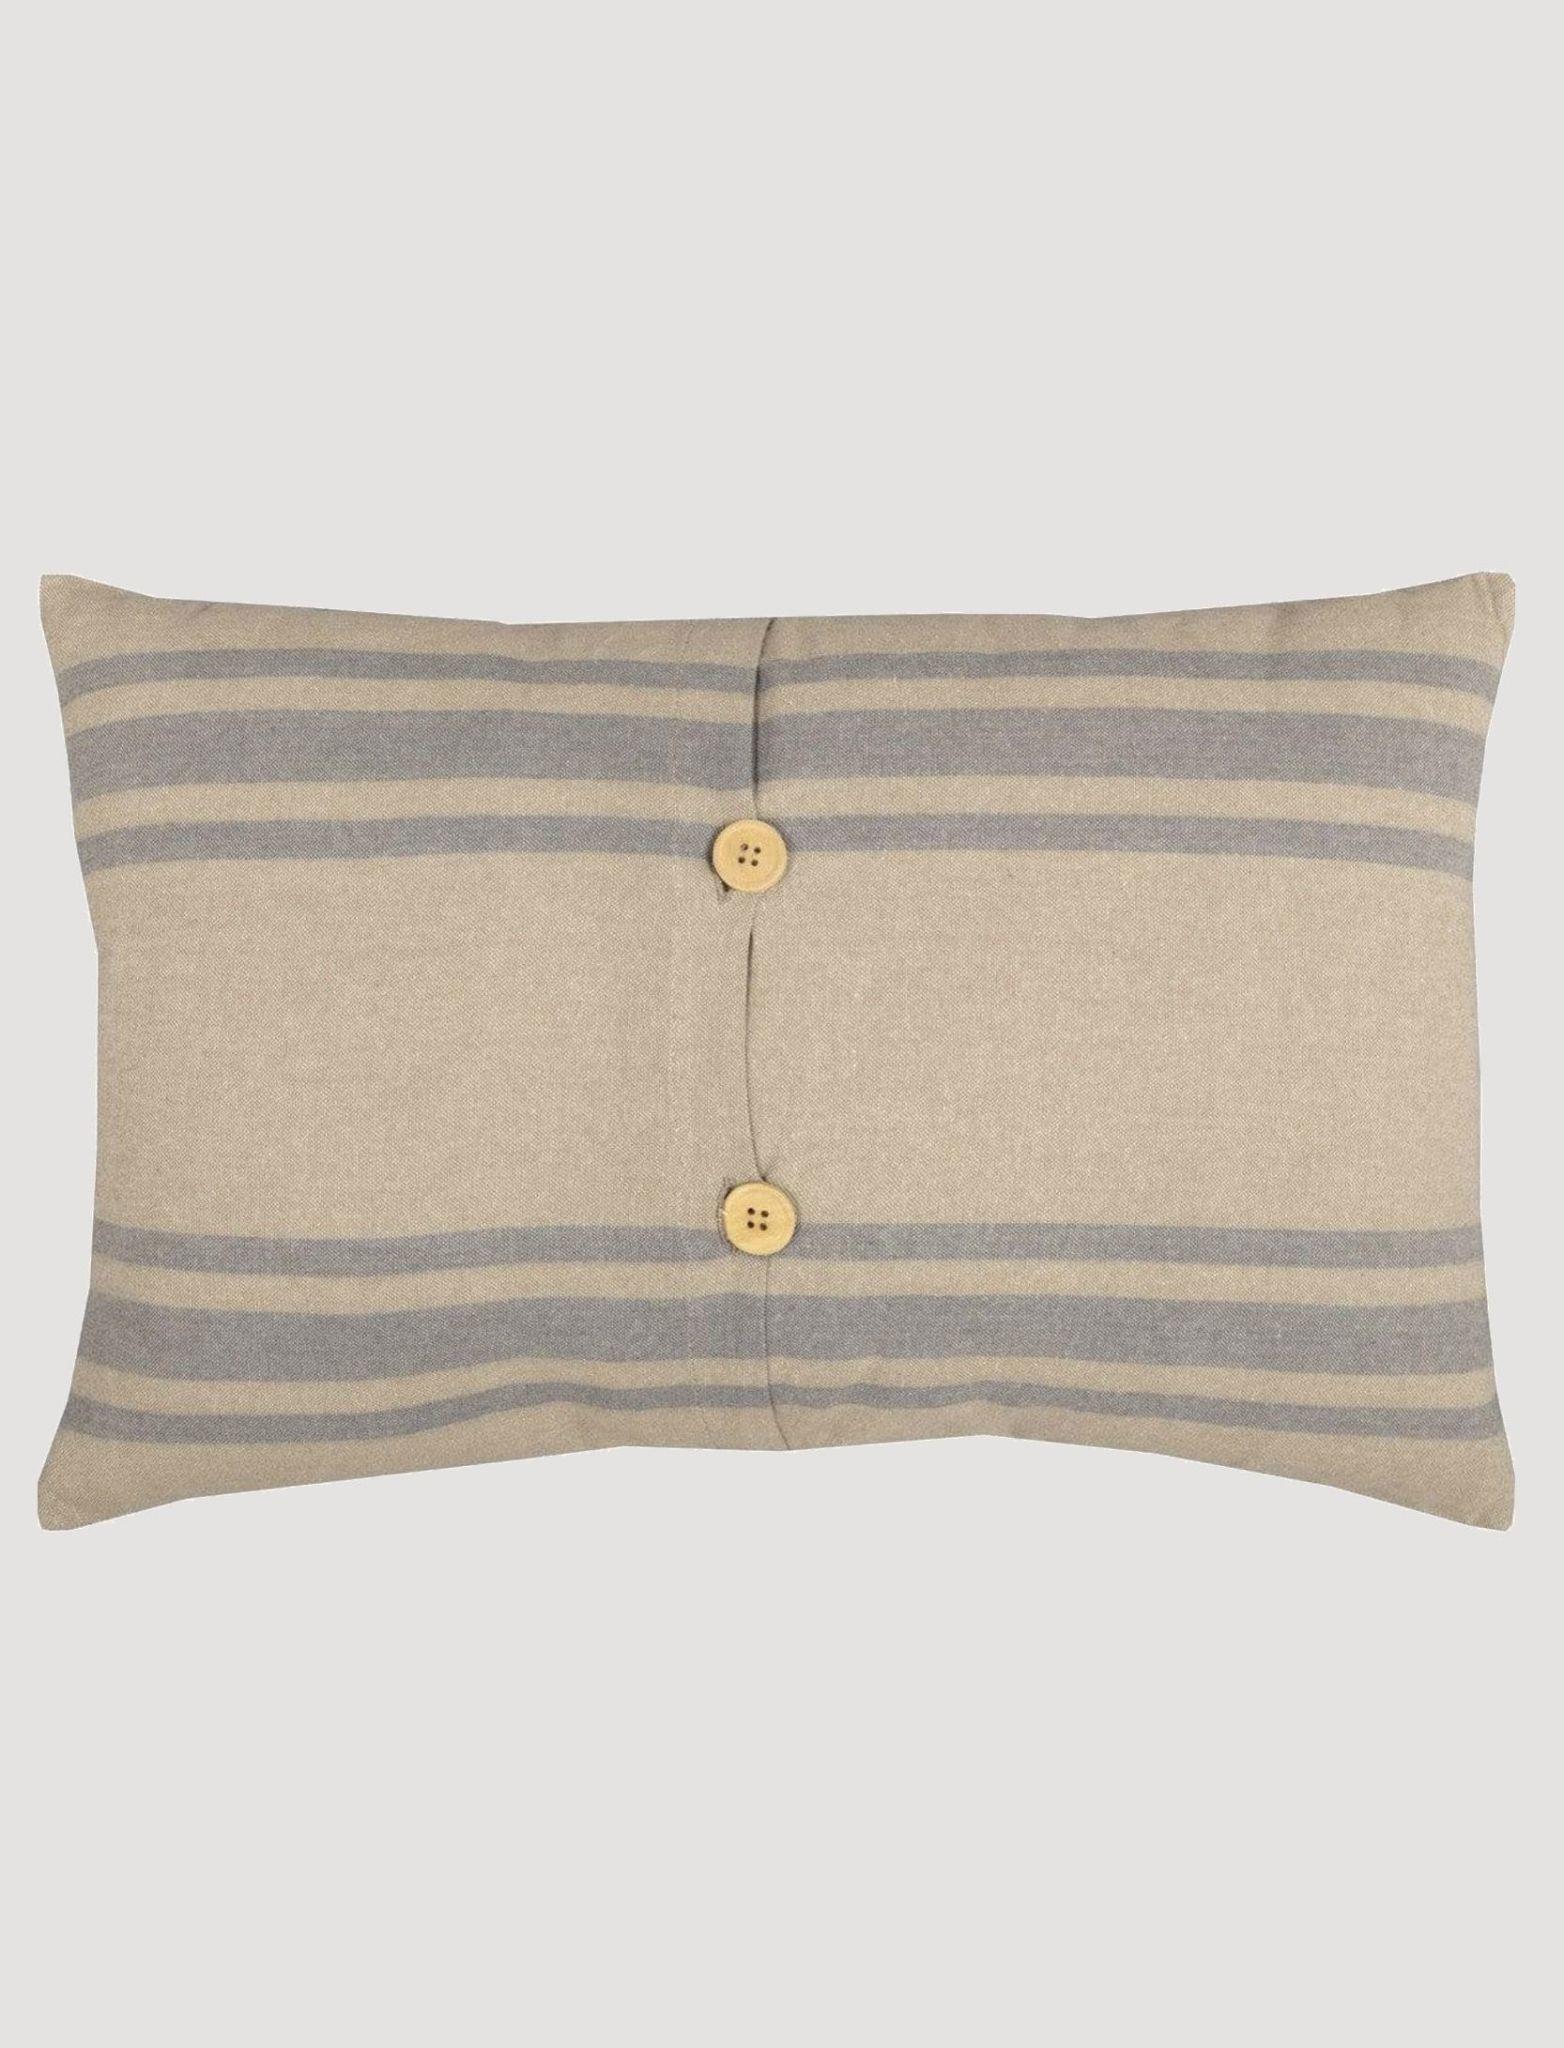 VHC Brands Farmer's Market Grain Sack Stripe Pillow 14x22